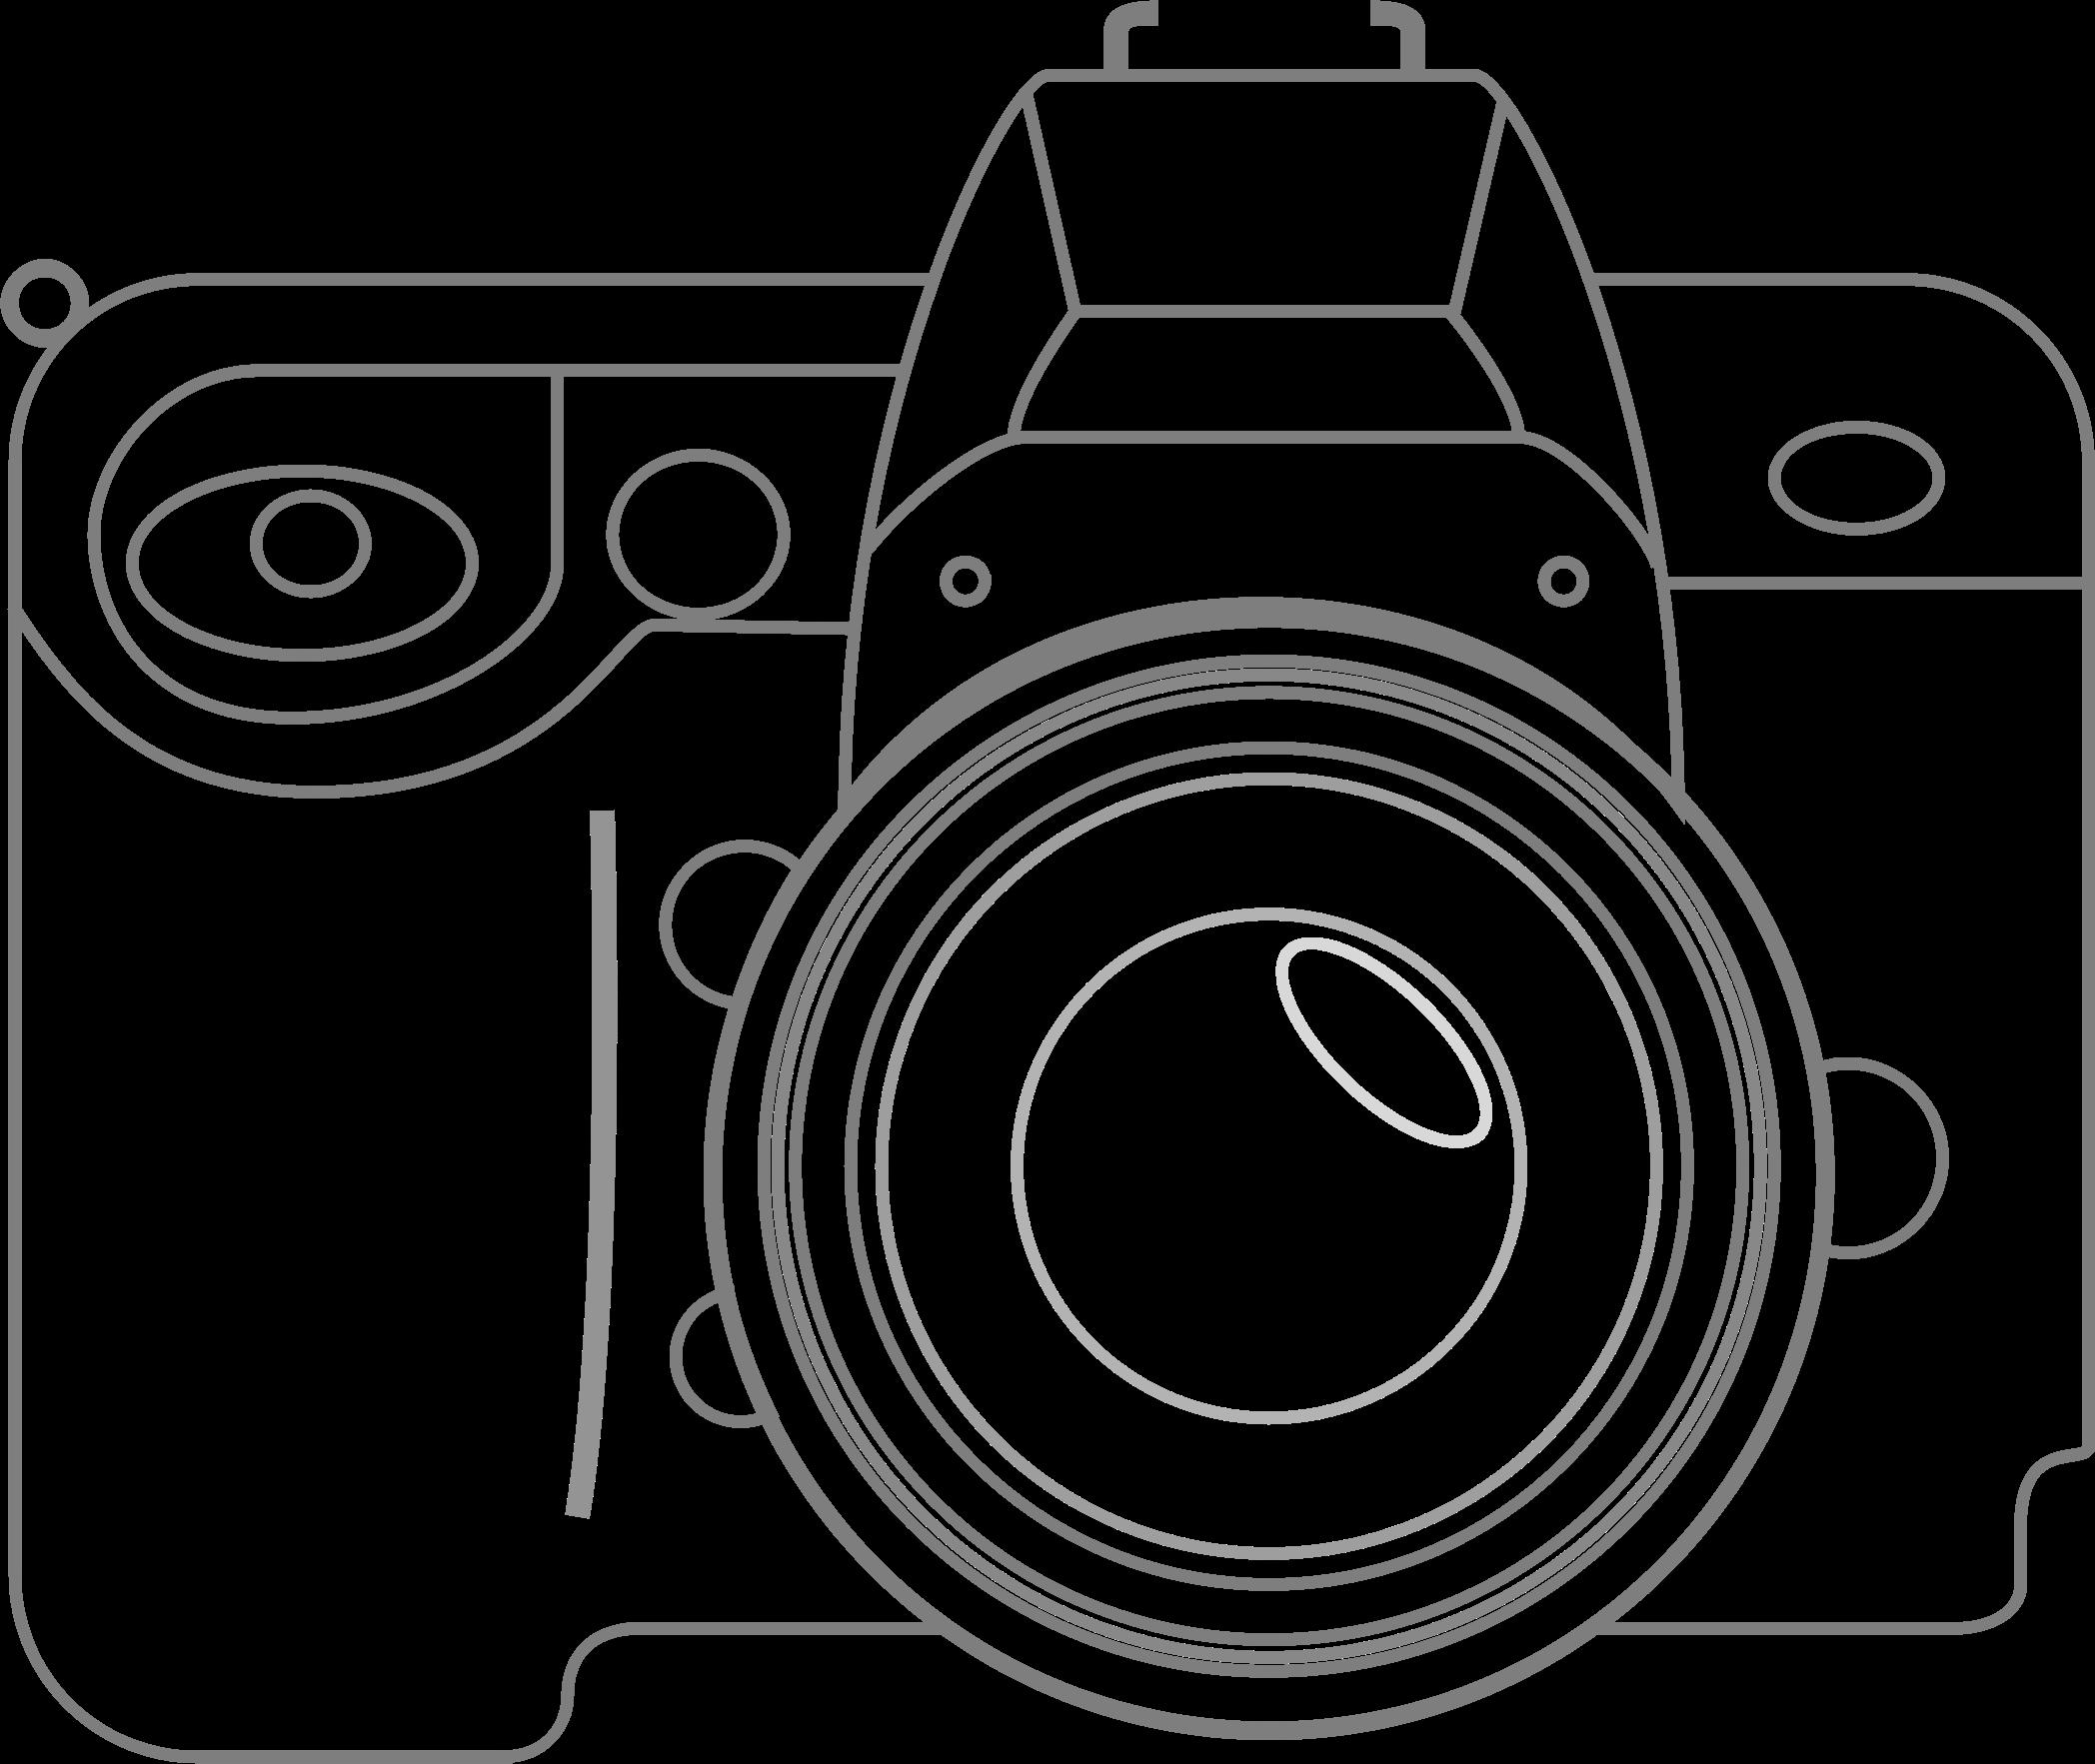 Nikon clipart slr camera Camera Clipart SLR Nikon Camera